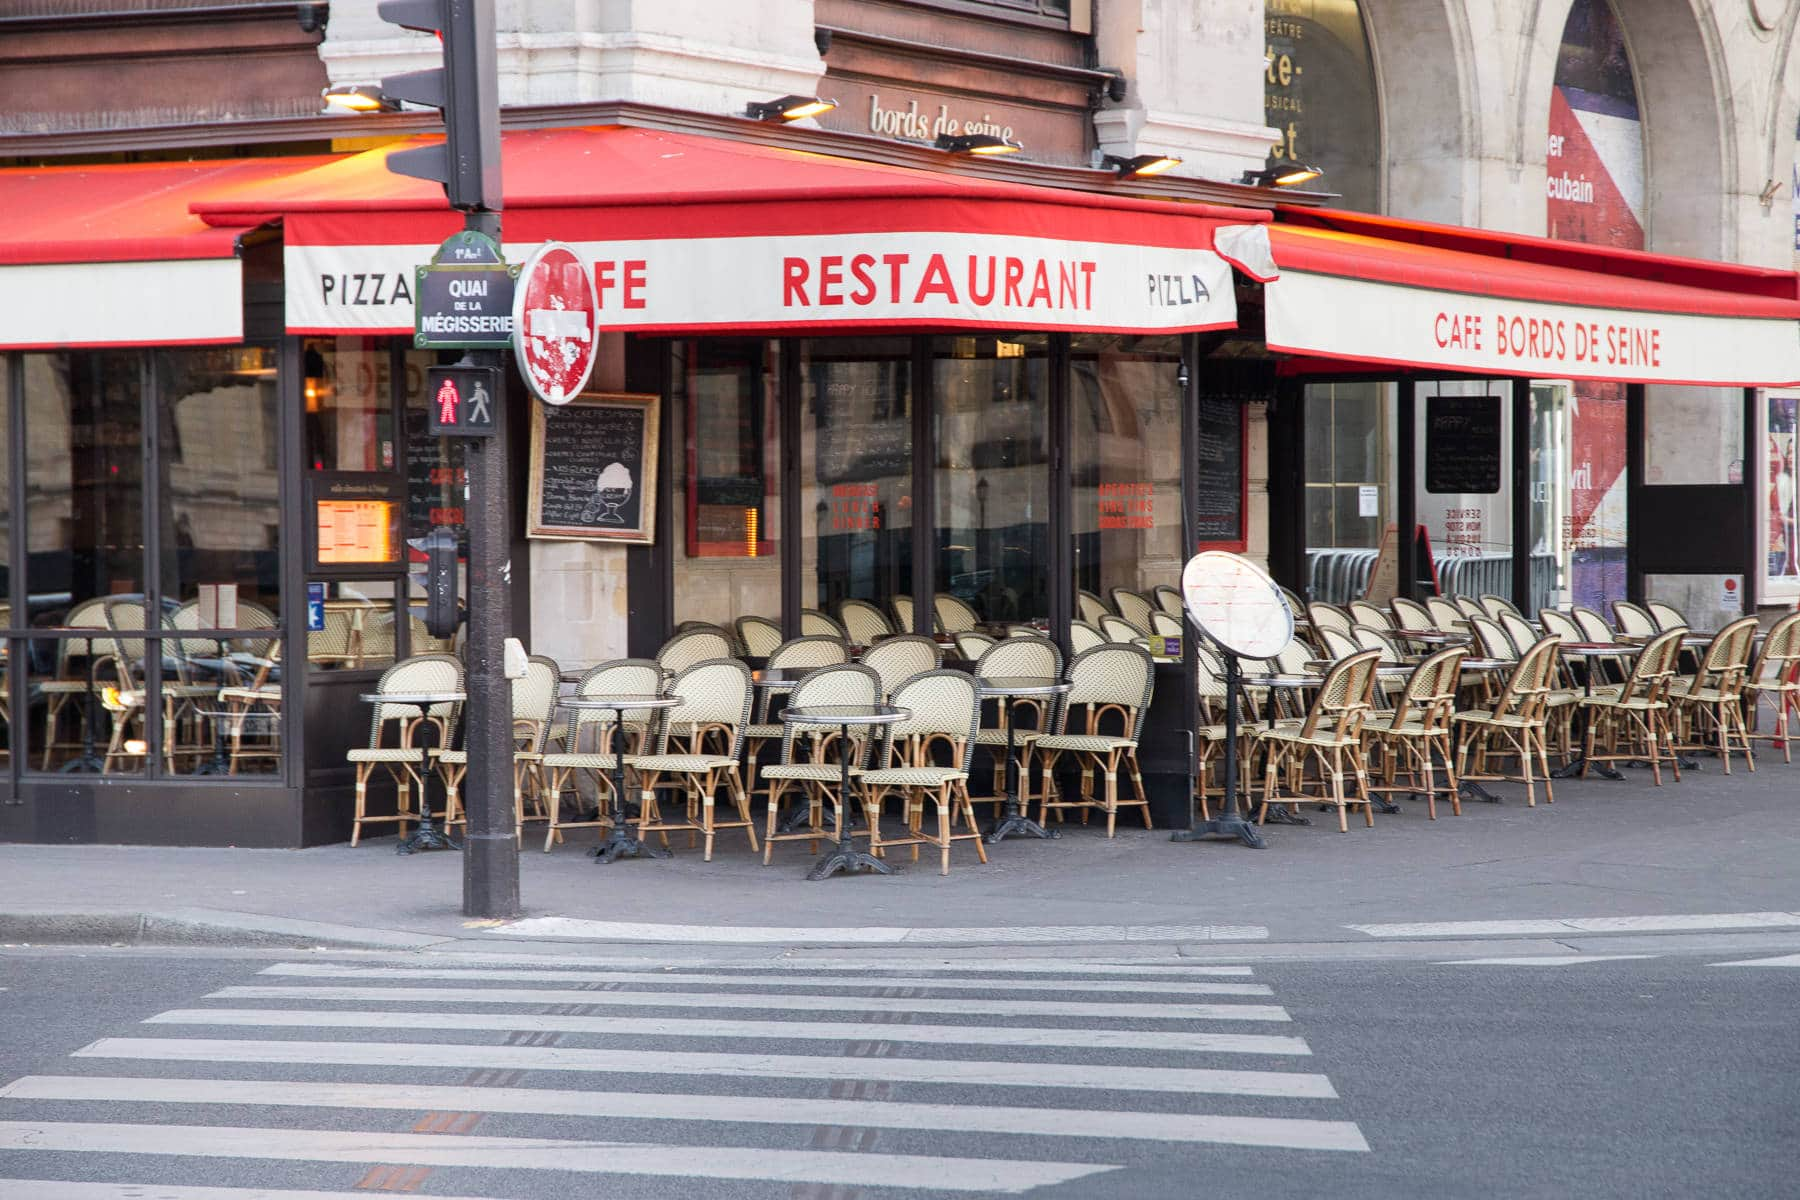 Meine Ultimativen Paris Tipps Geheimtipps Hotels Restaurants